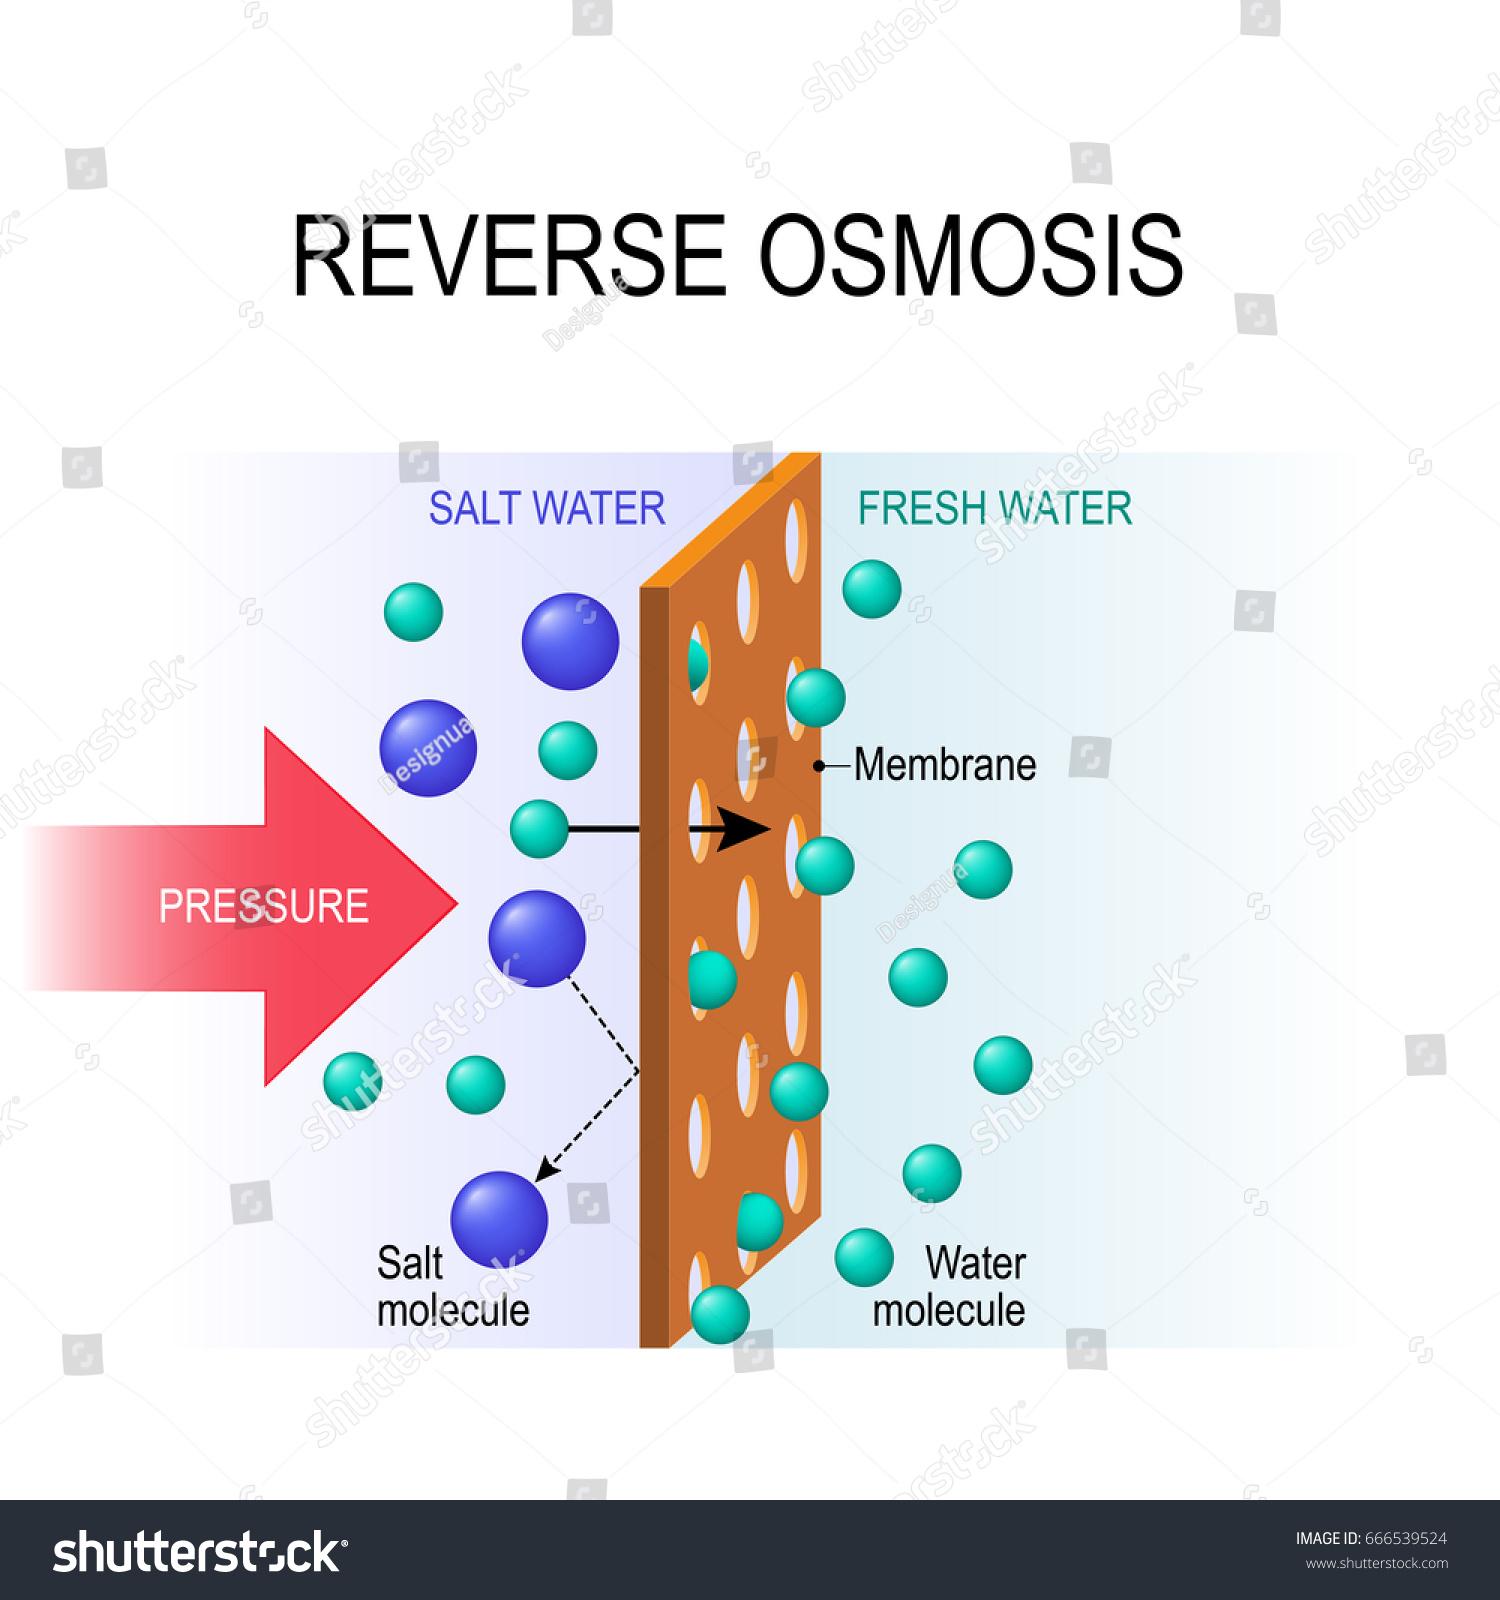 Reverse Osmosis Desalination Pressure Water Molecules Stock